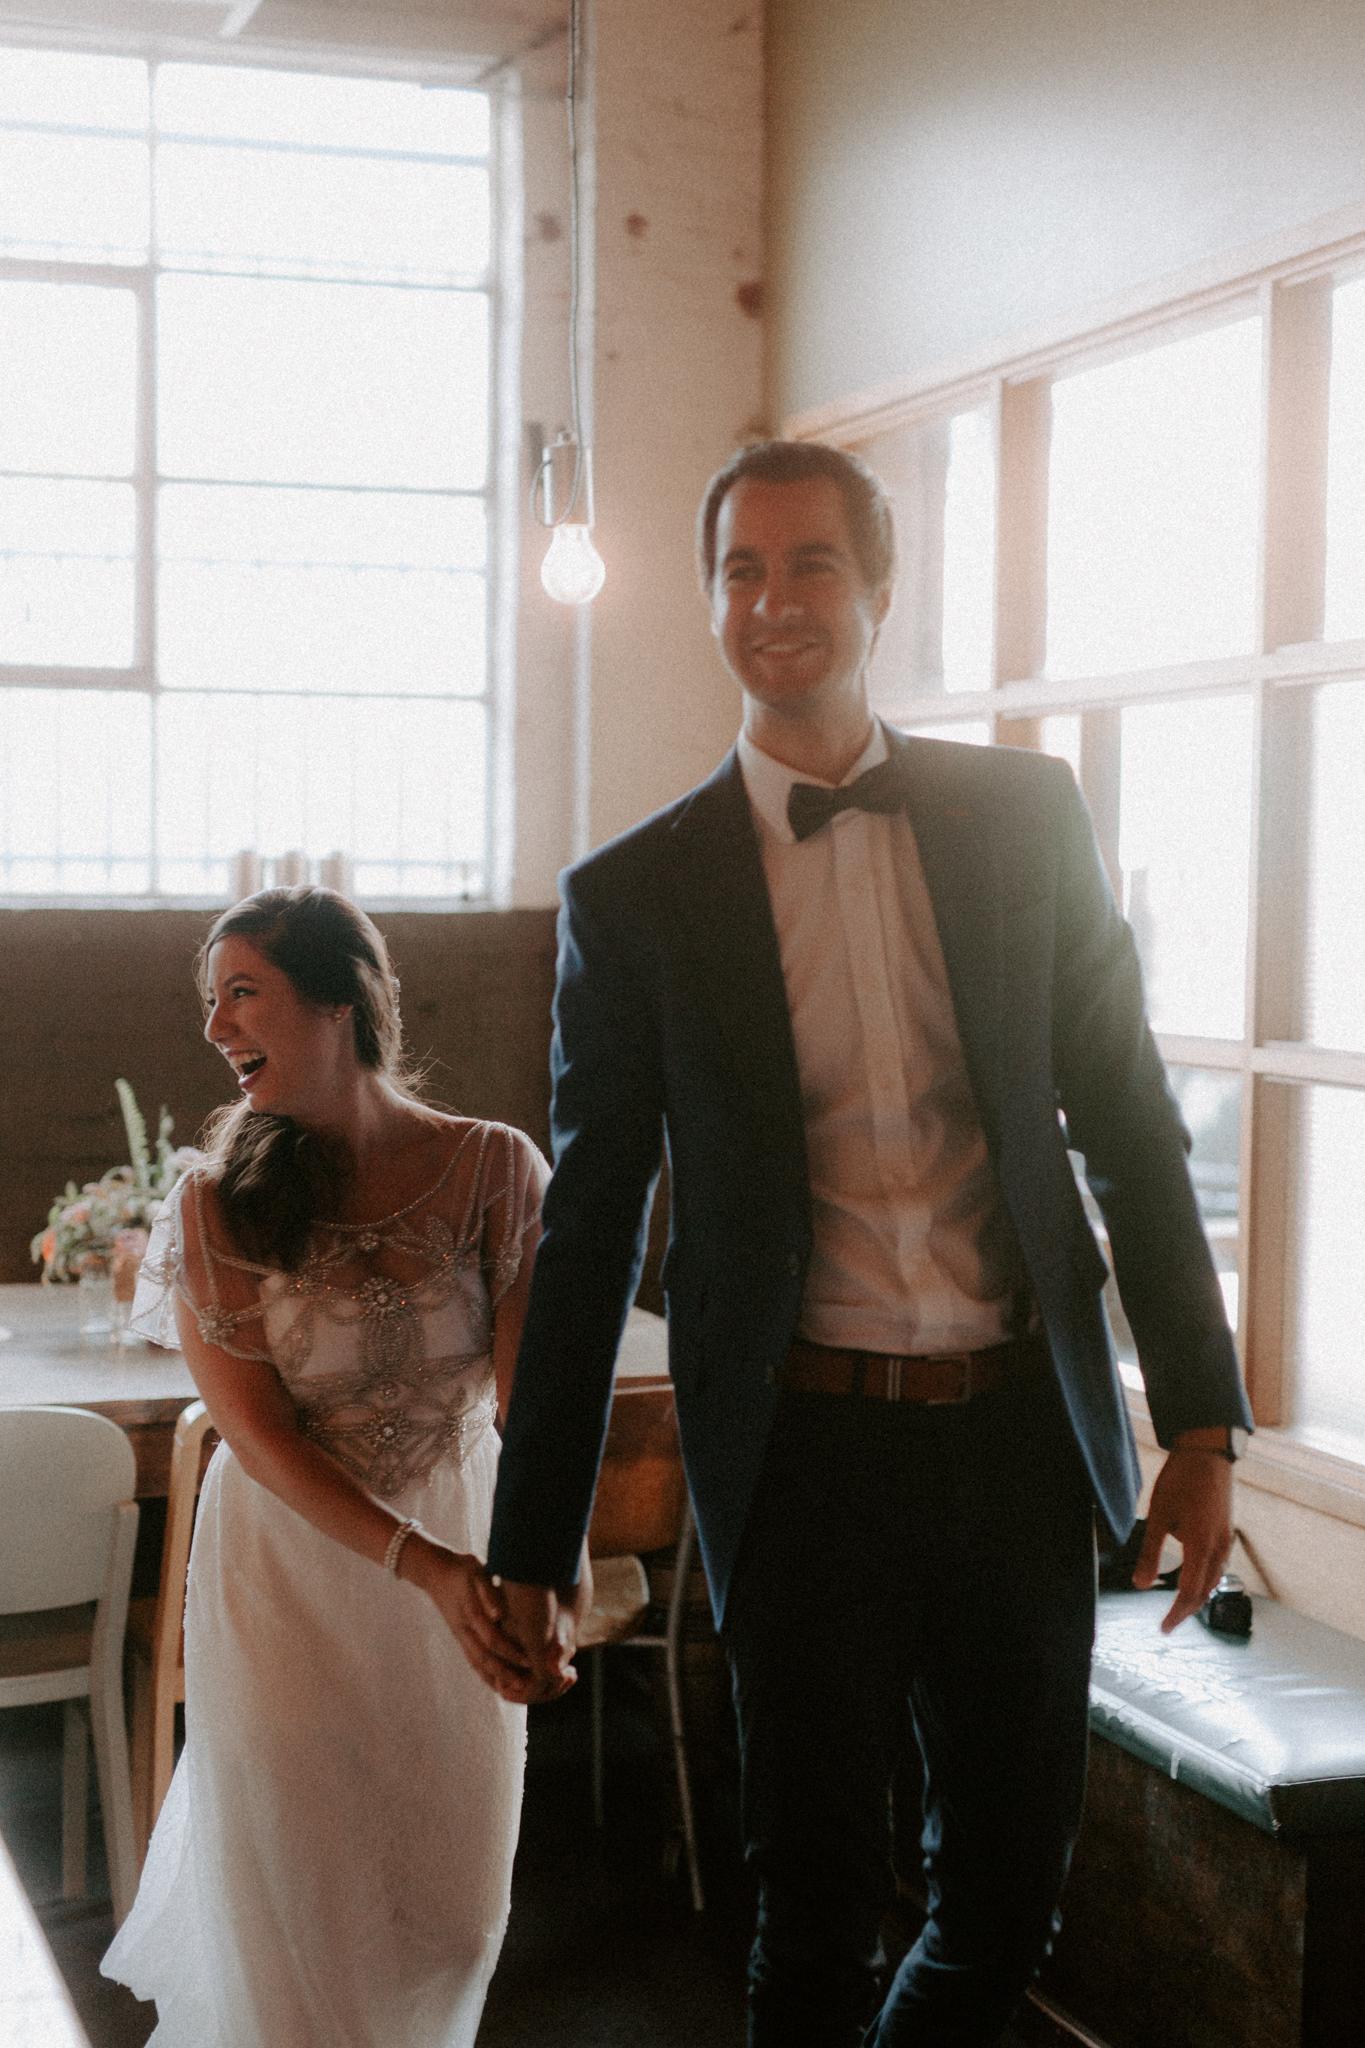 St-Ali-Wedding-Emotions-and-Math-Photography-043.jpg